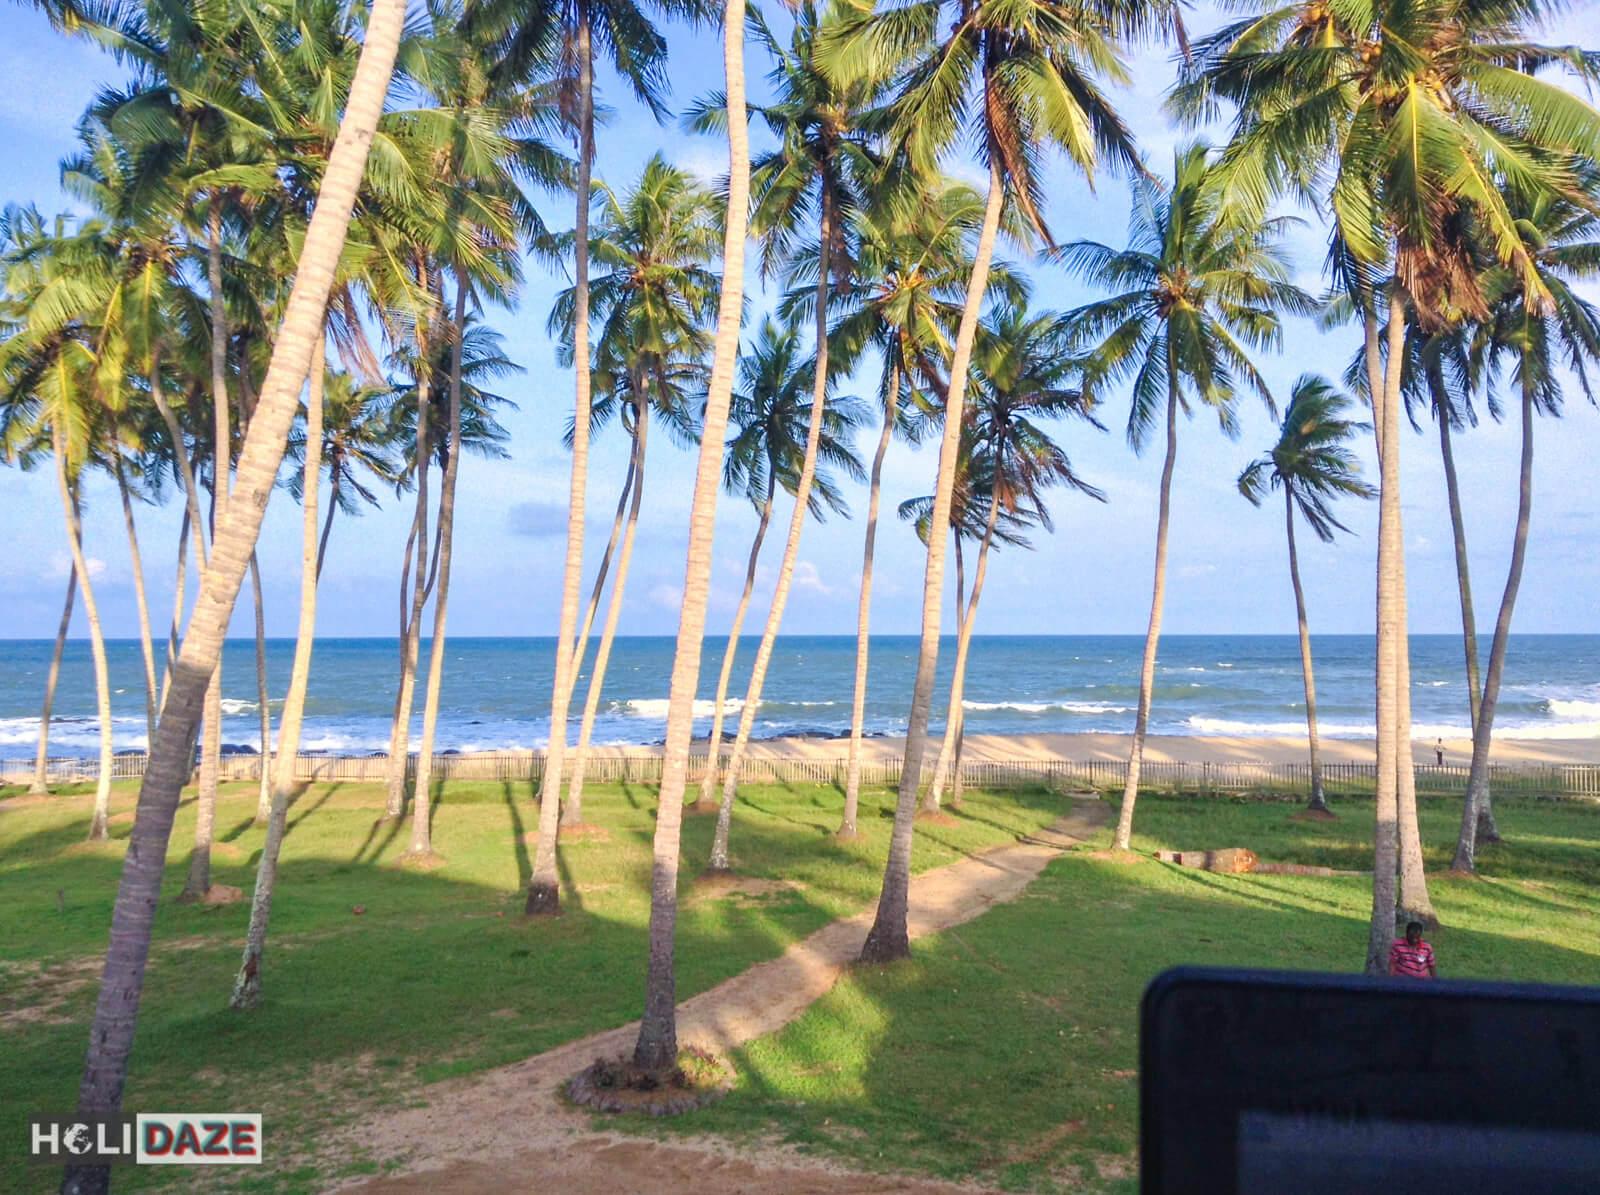 View from my private villa in Arugam Bay, Sri Lanka